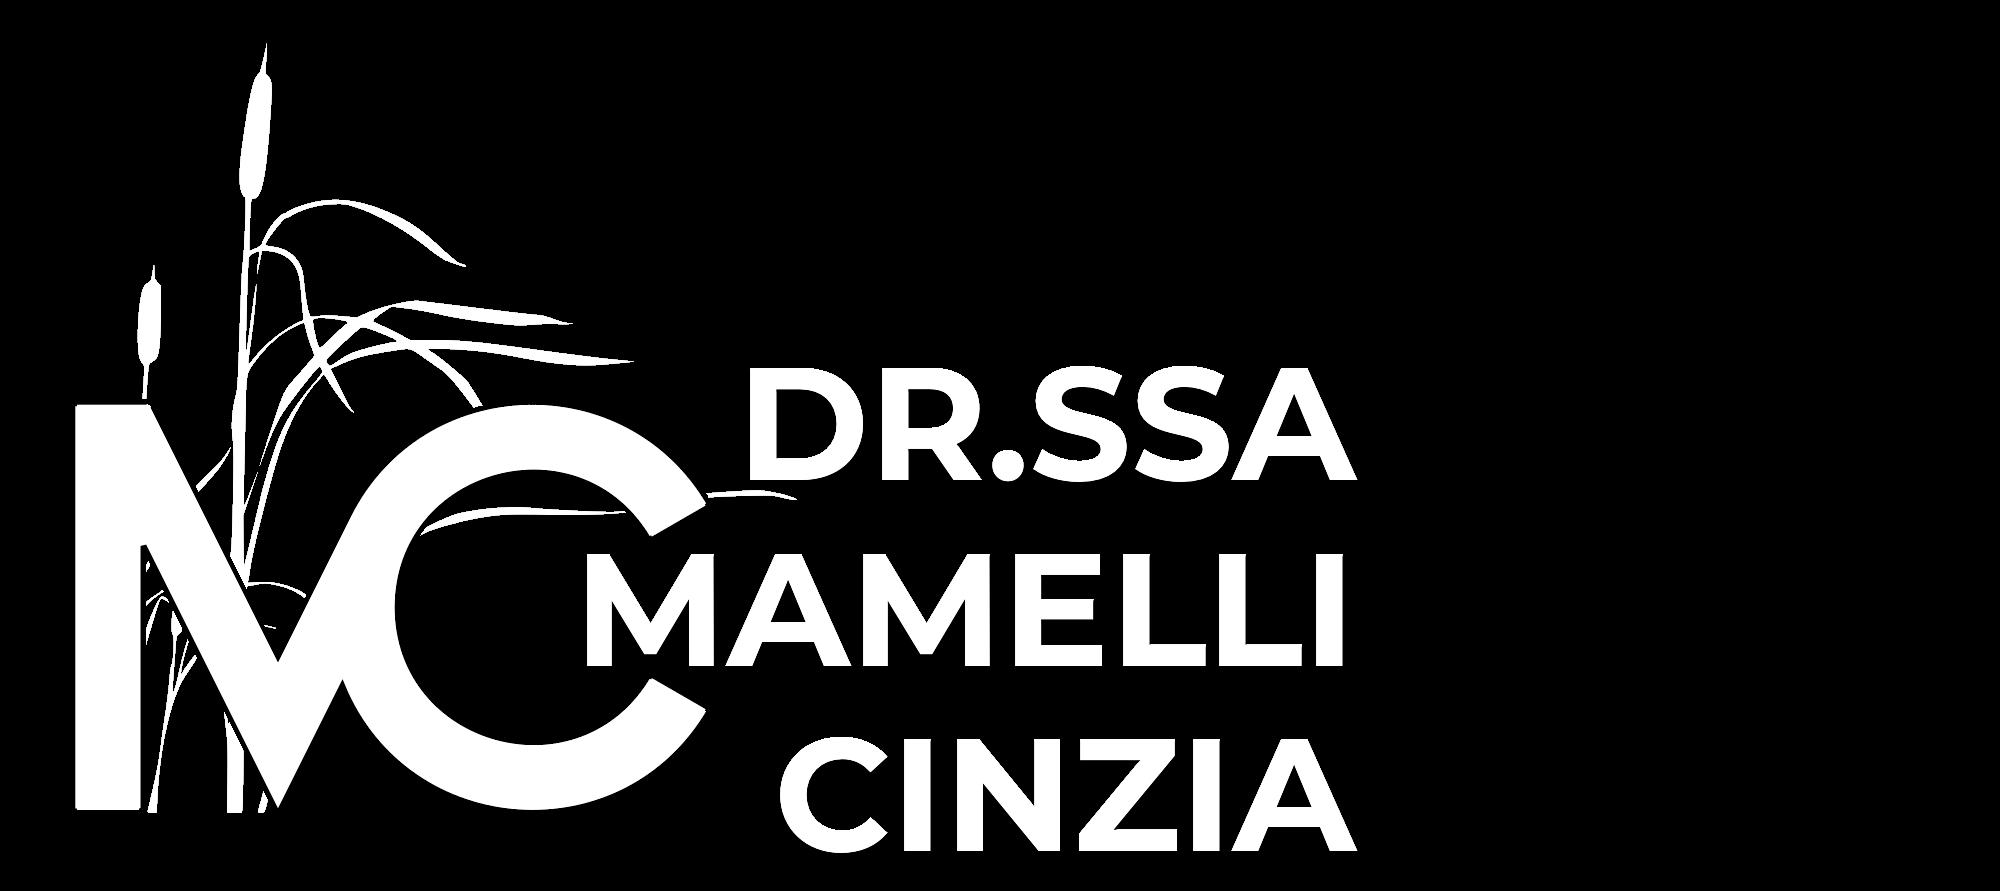 Drssa Cinzia Mamelli